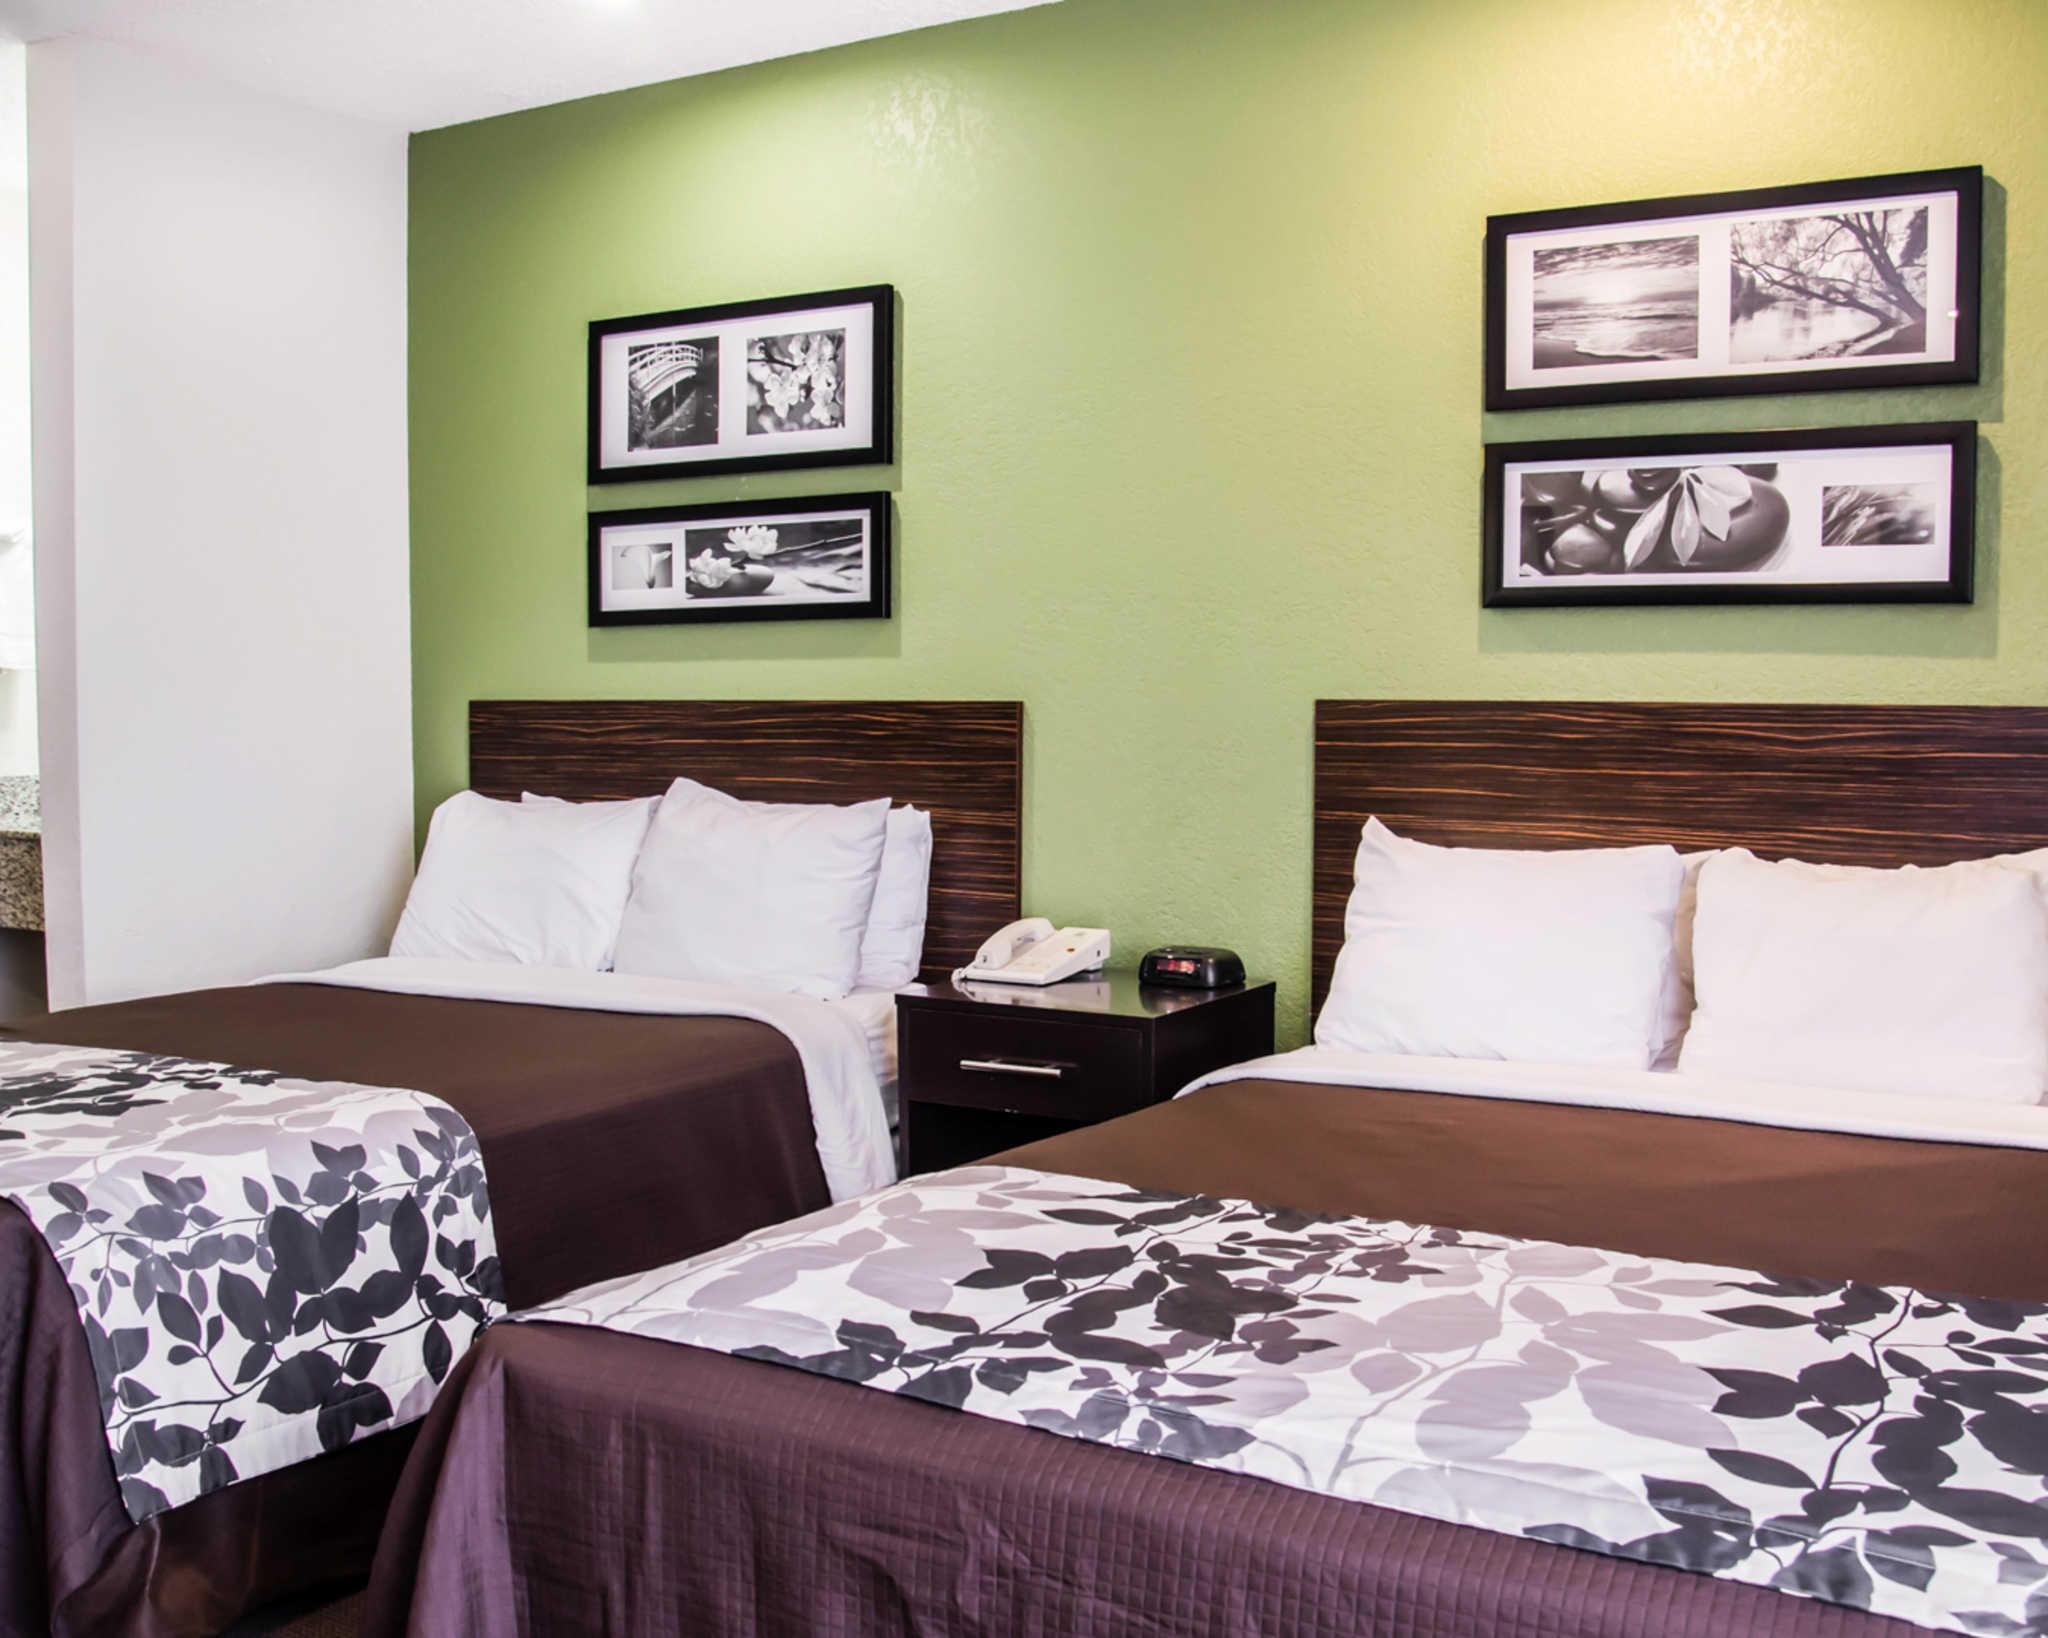 Sleep Inn Concord - Kannapolis image 16